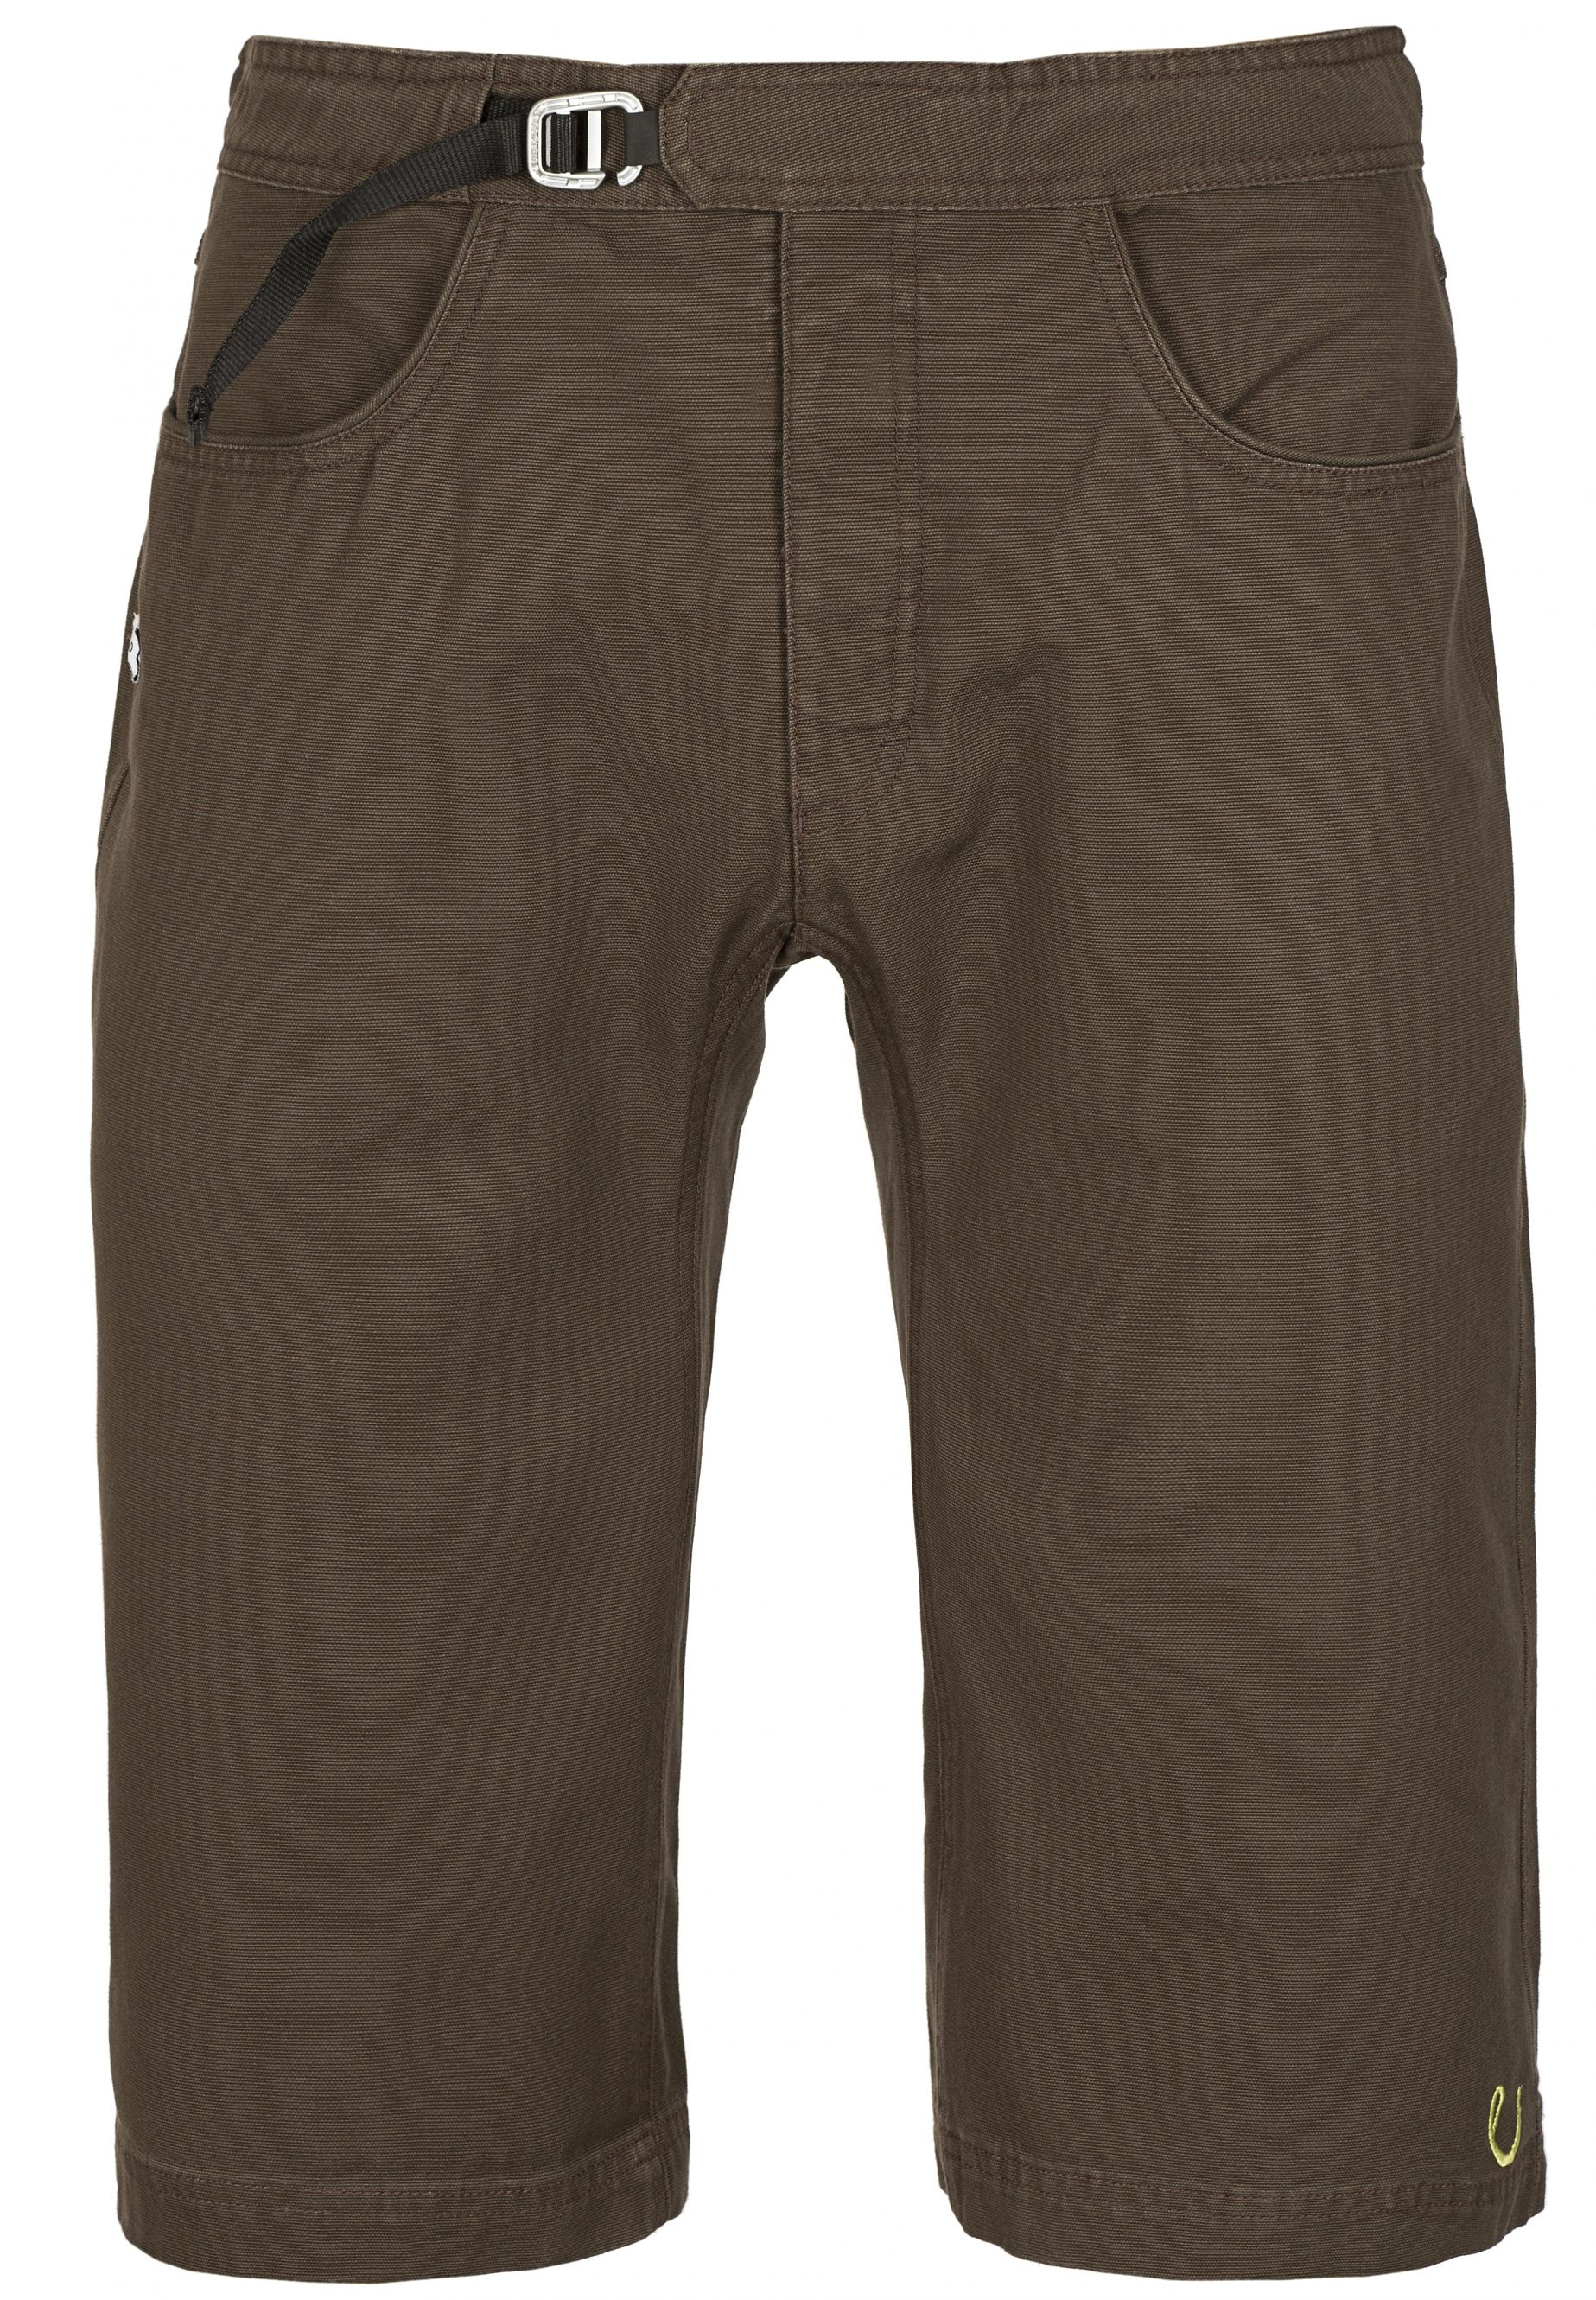 Edelrid Hose »Shorts«